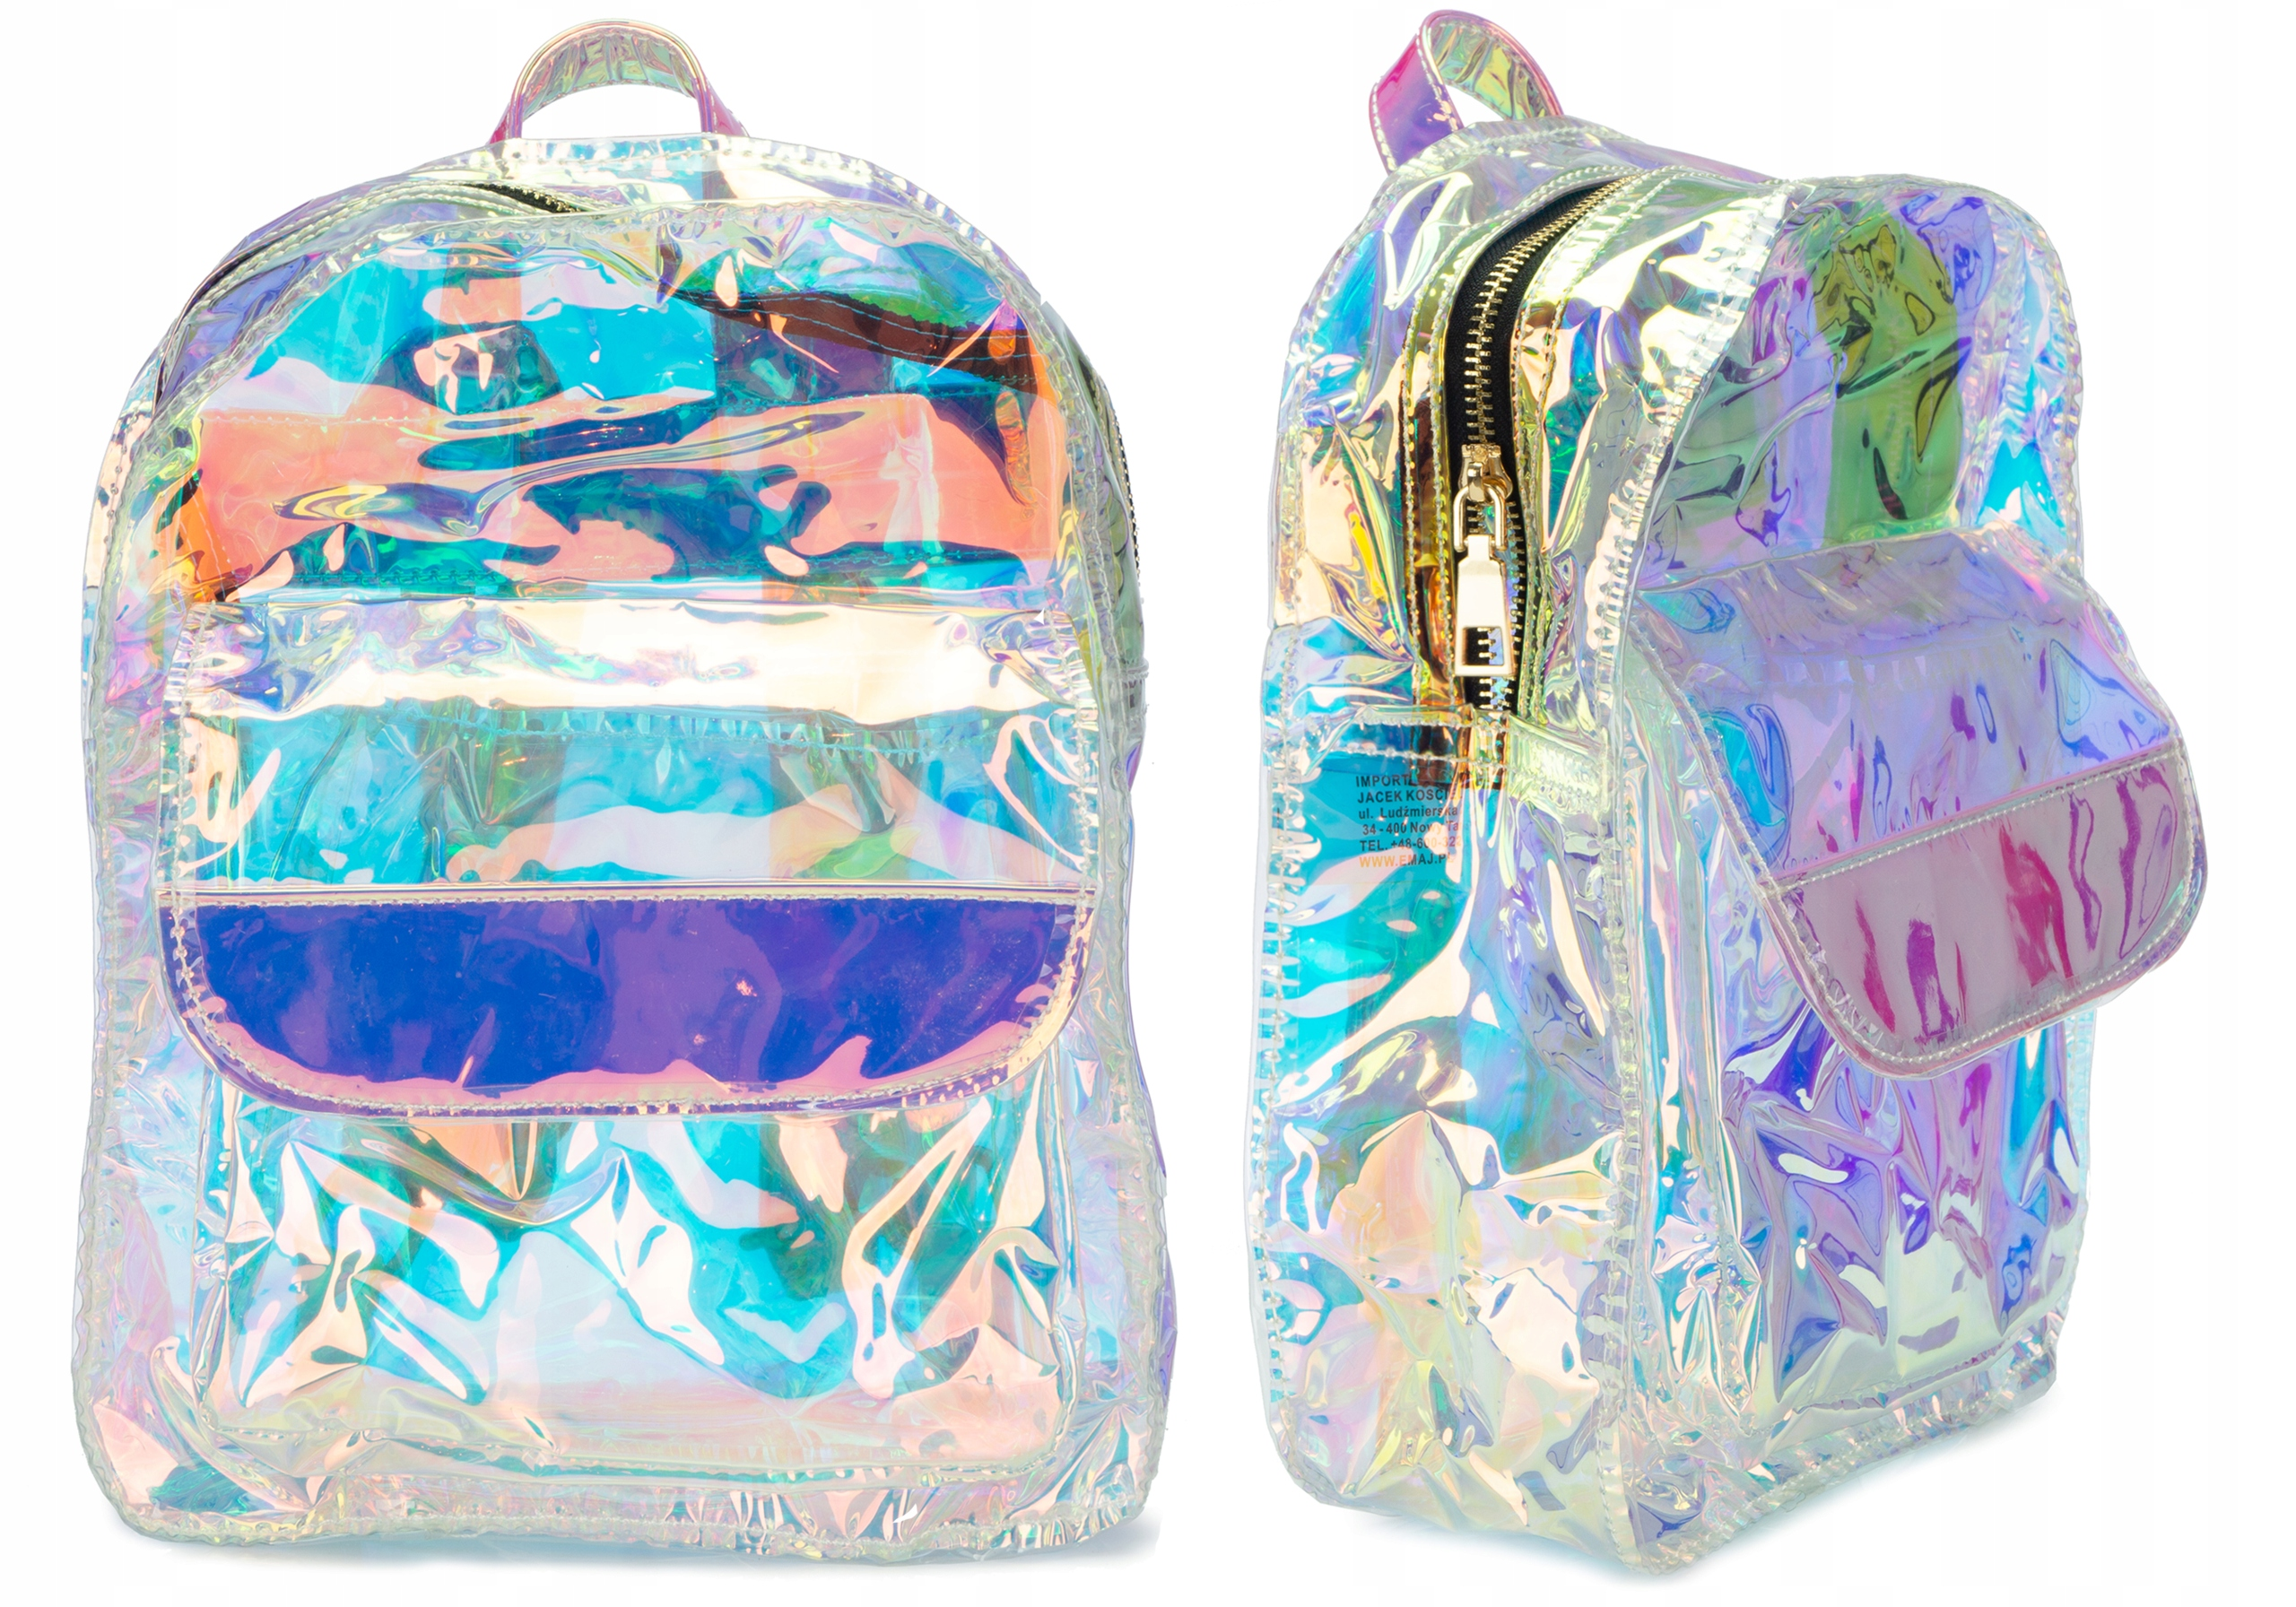 Plecak Hologramowy Lustrzanka Plecaczek E0841 Emaj